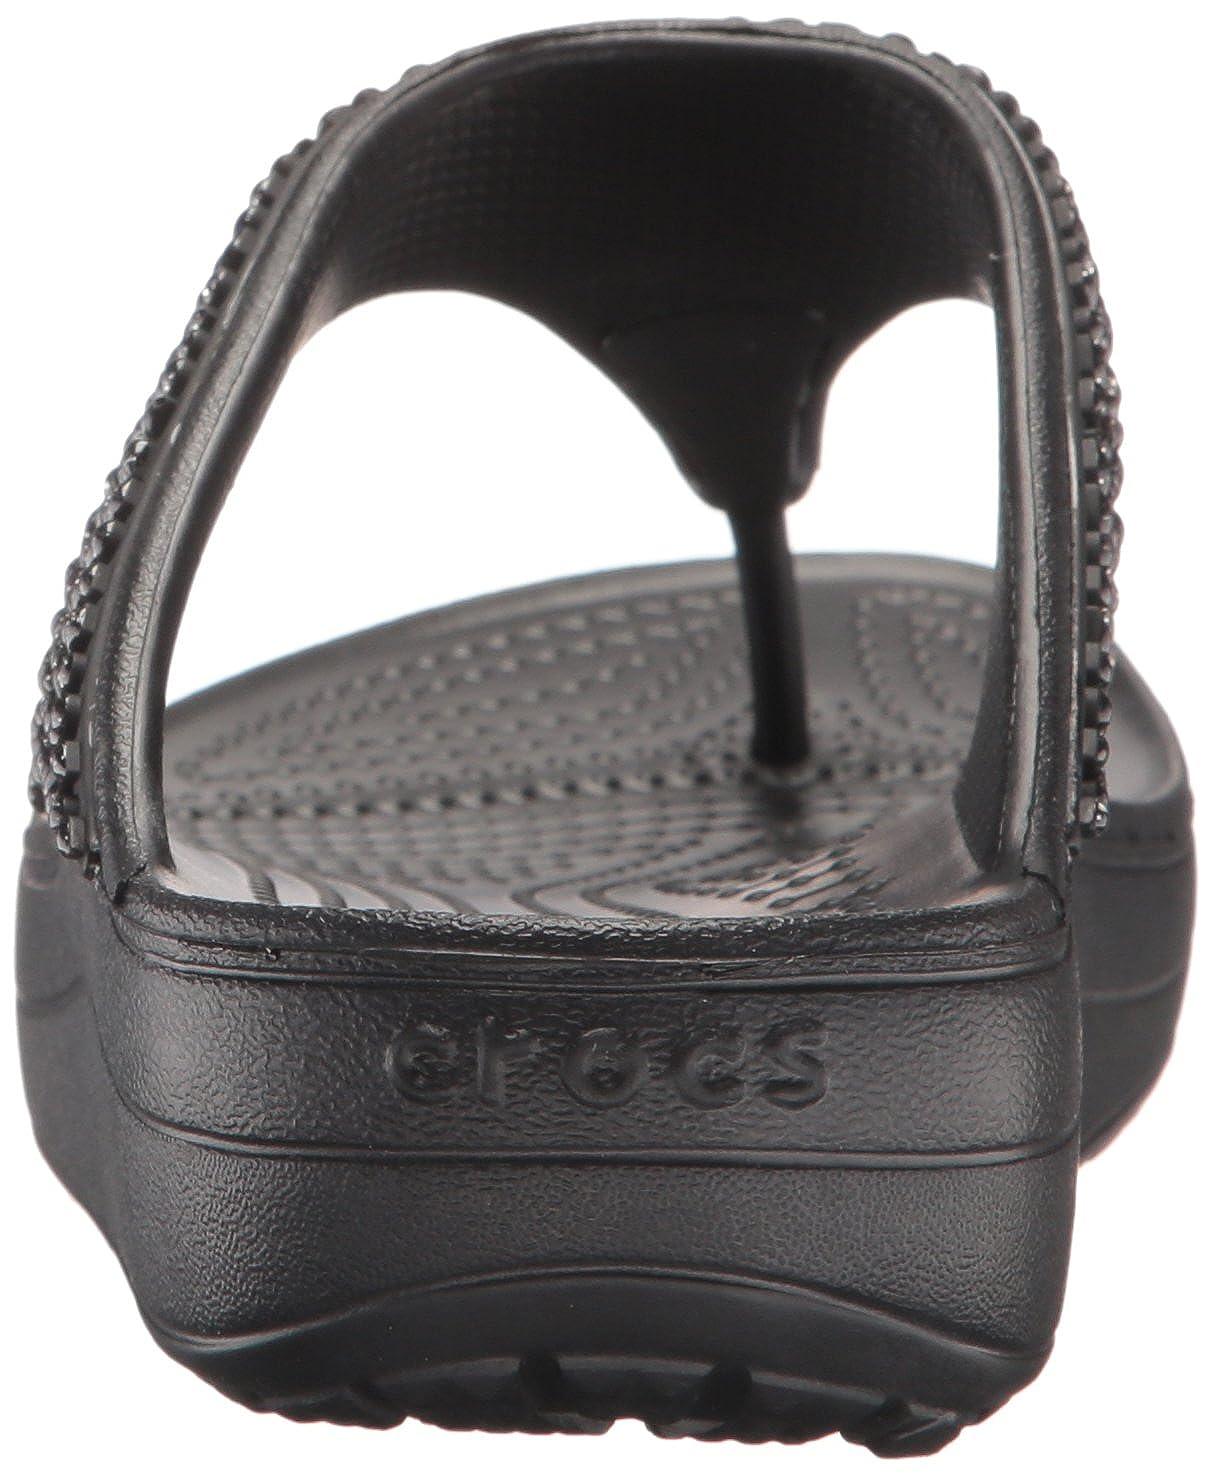 33d80ce4fe5c Crocs Women s Sloane Embellished Flip Flop  Crocs  Amazon.ca  Shoes    Handbags